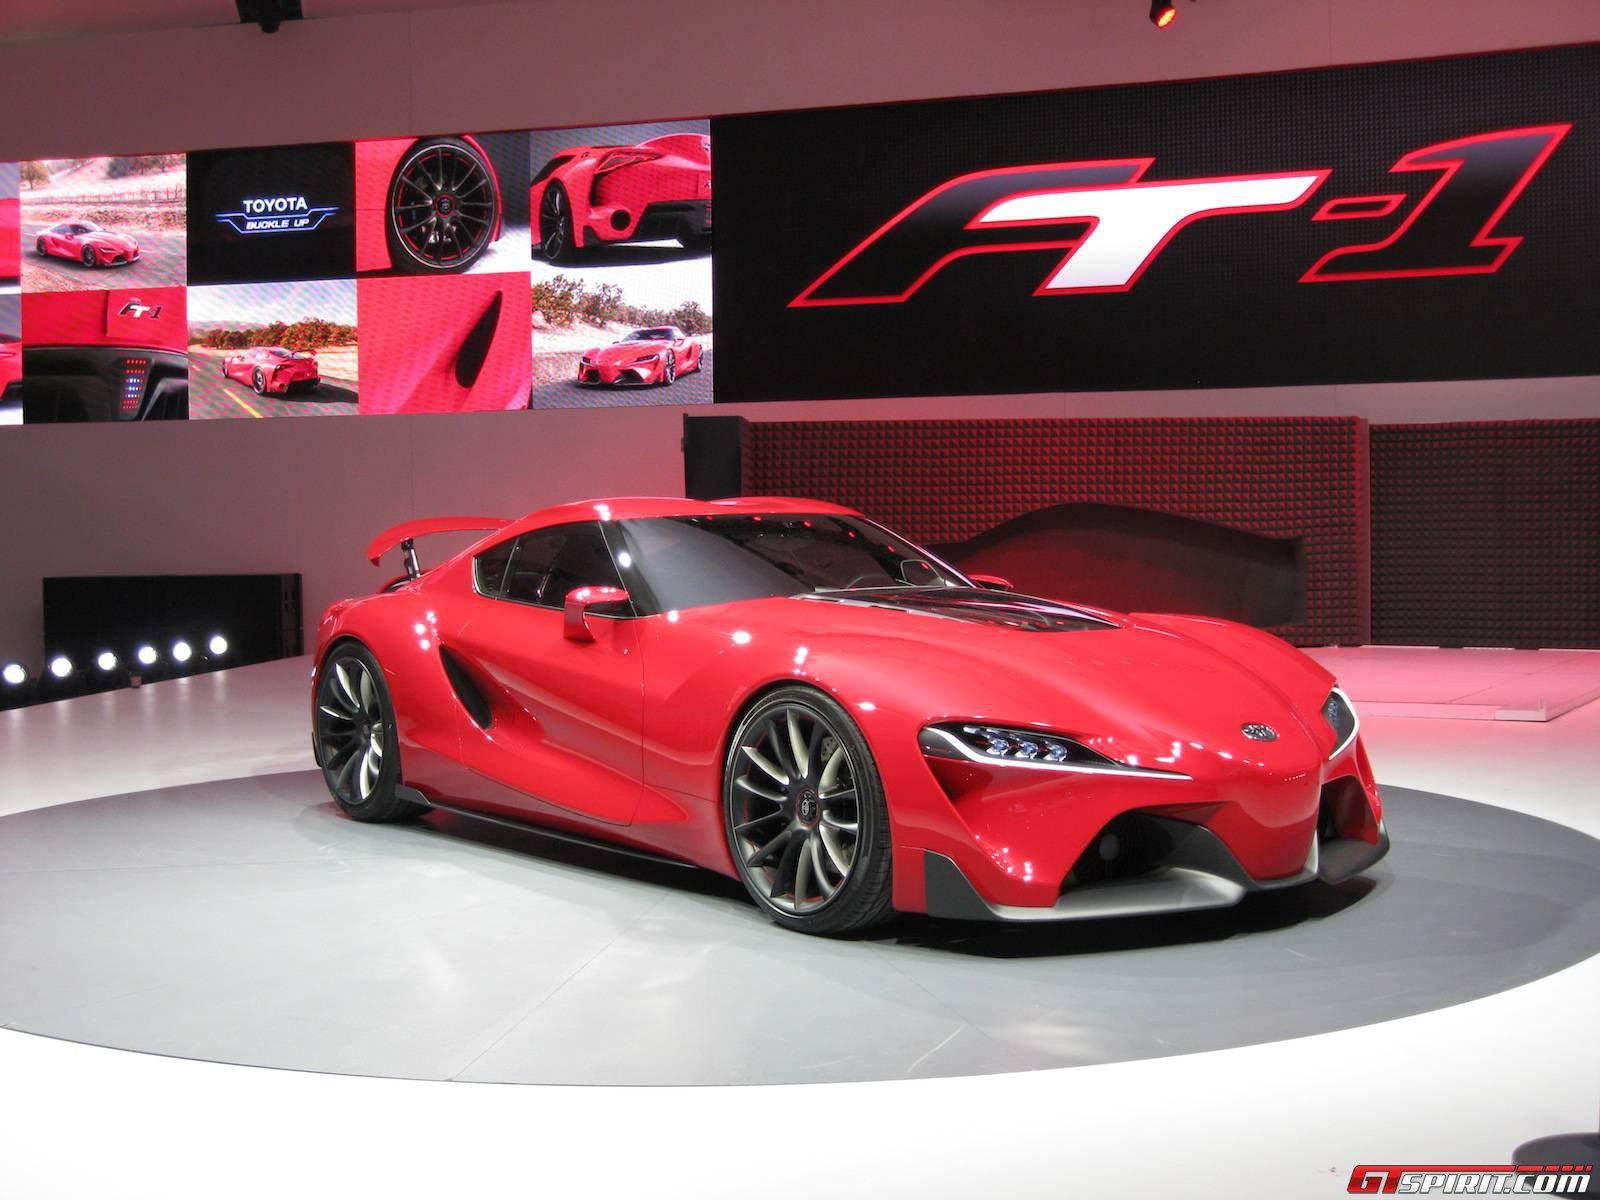 Detroit 2014 Toyota Ft 1 Concept Gtspirit